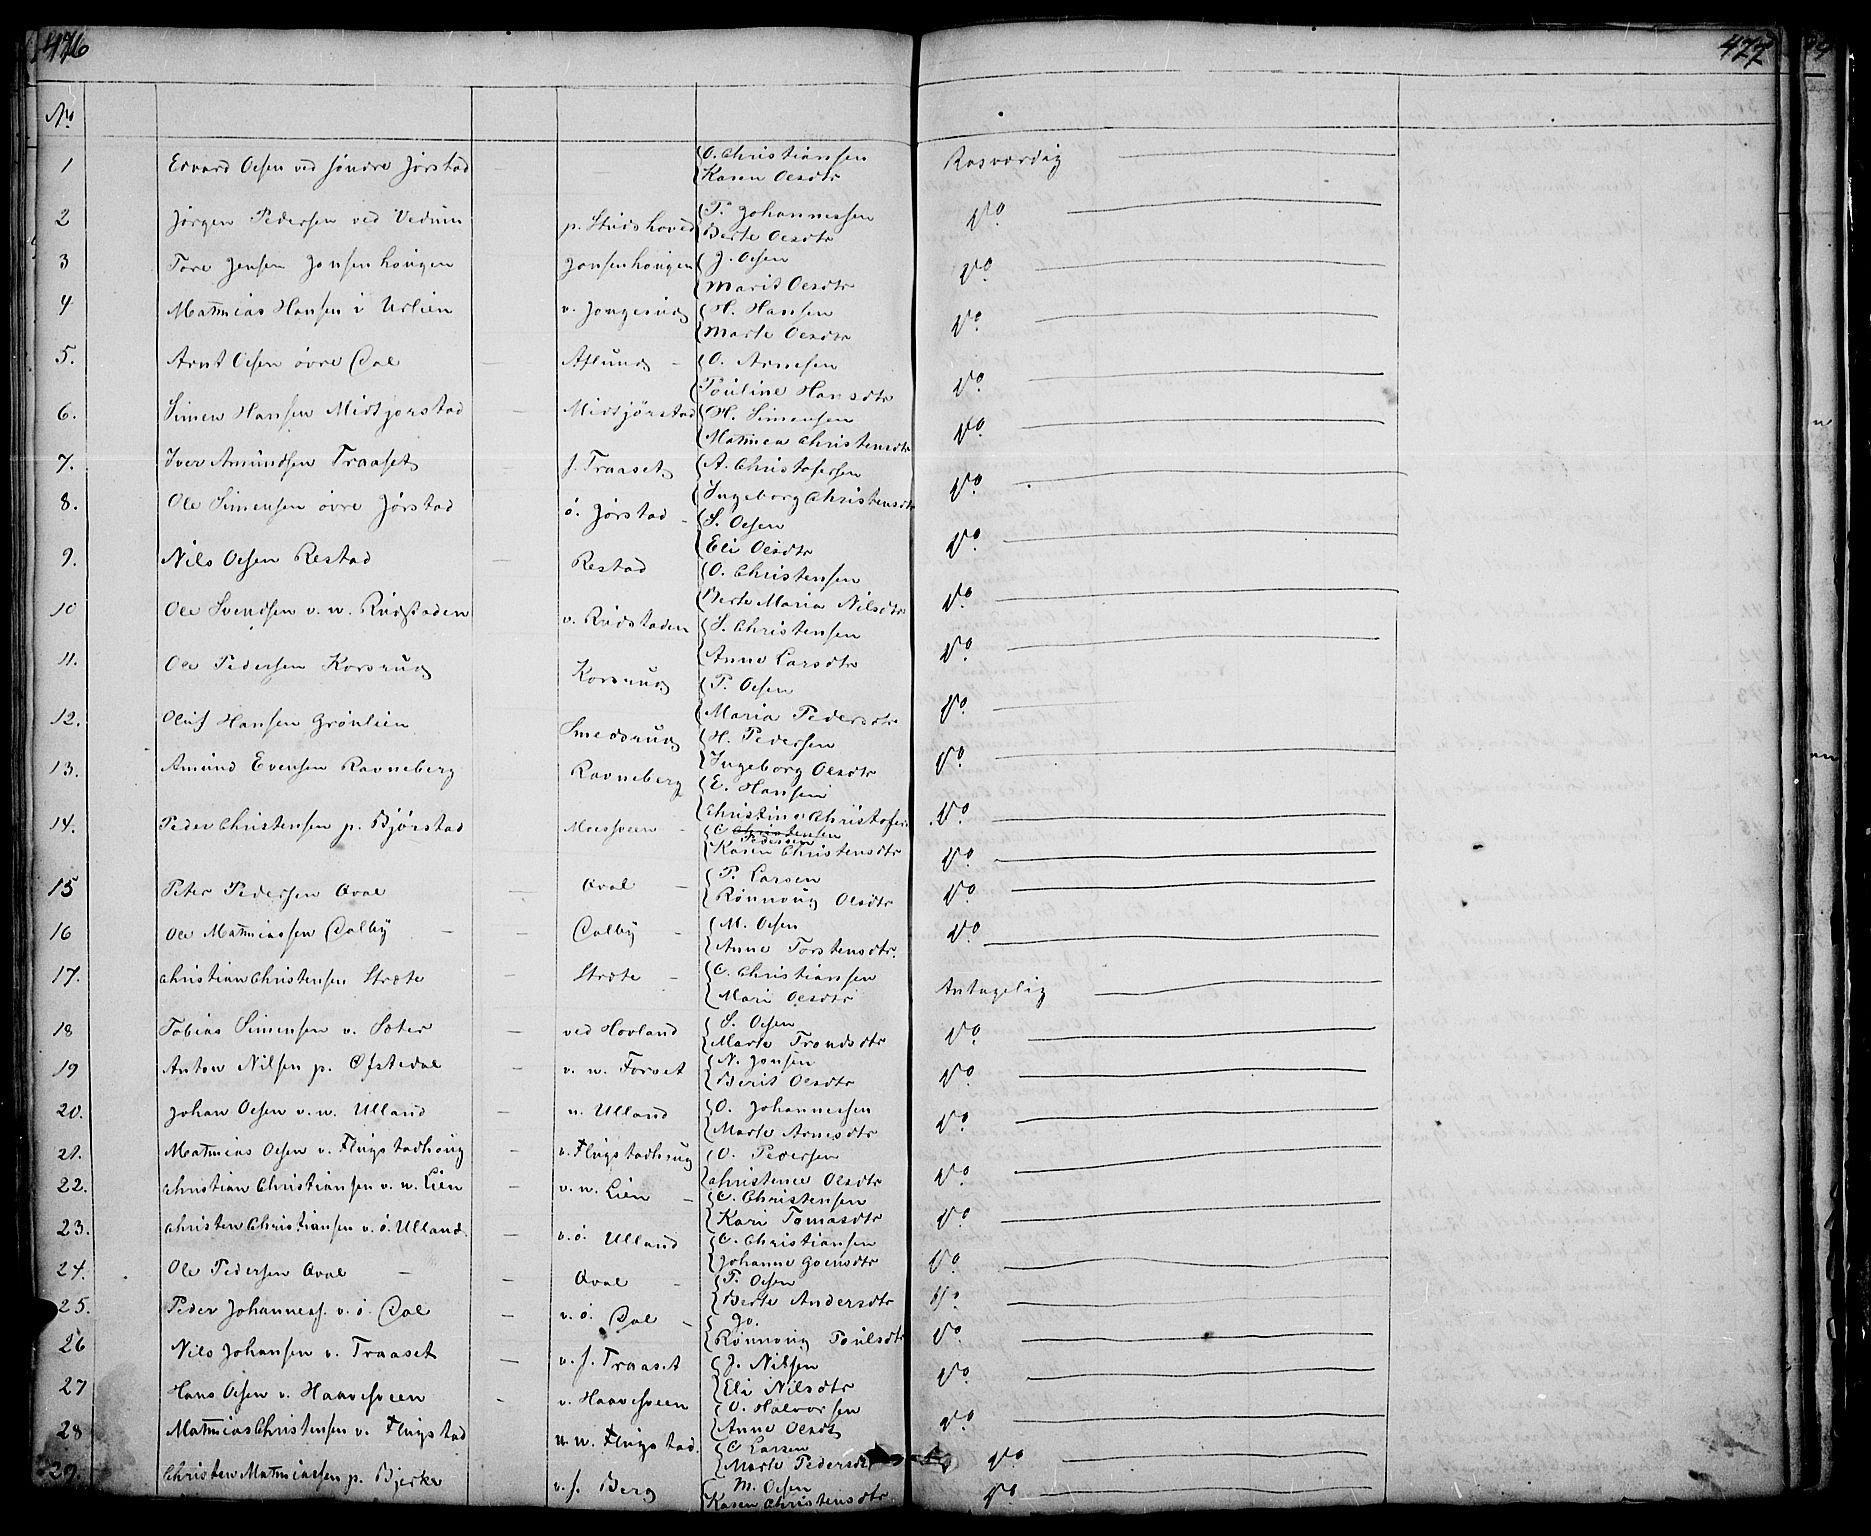 SAH, Fåberg prestekontor, Klokkerbok nr. 5, 1837-1864, s. 476-477